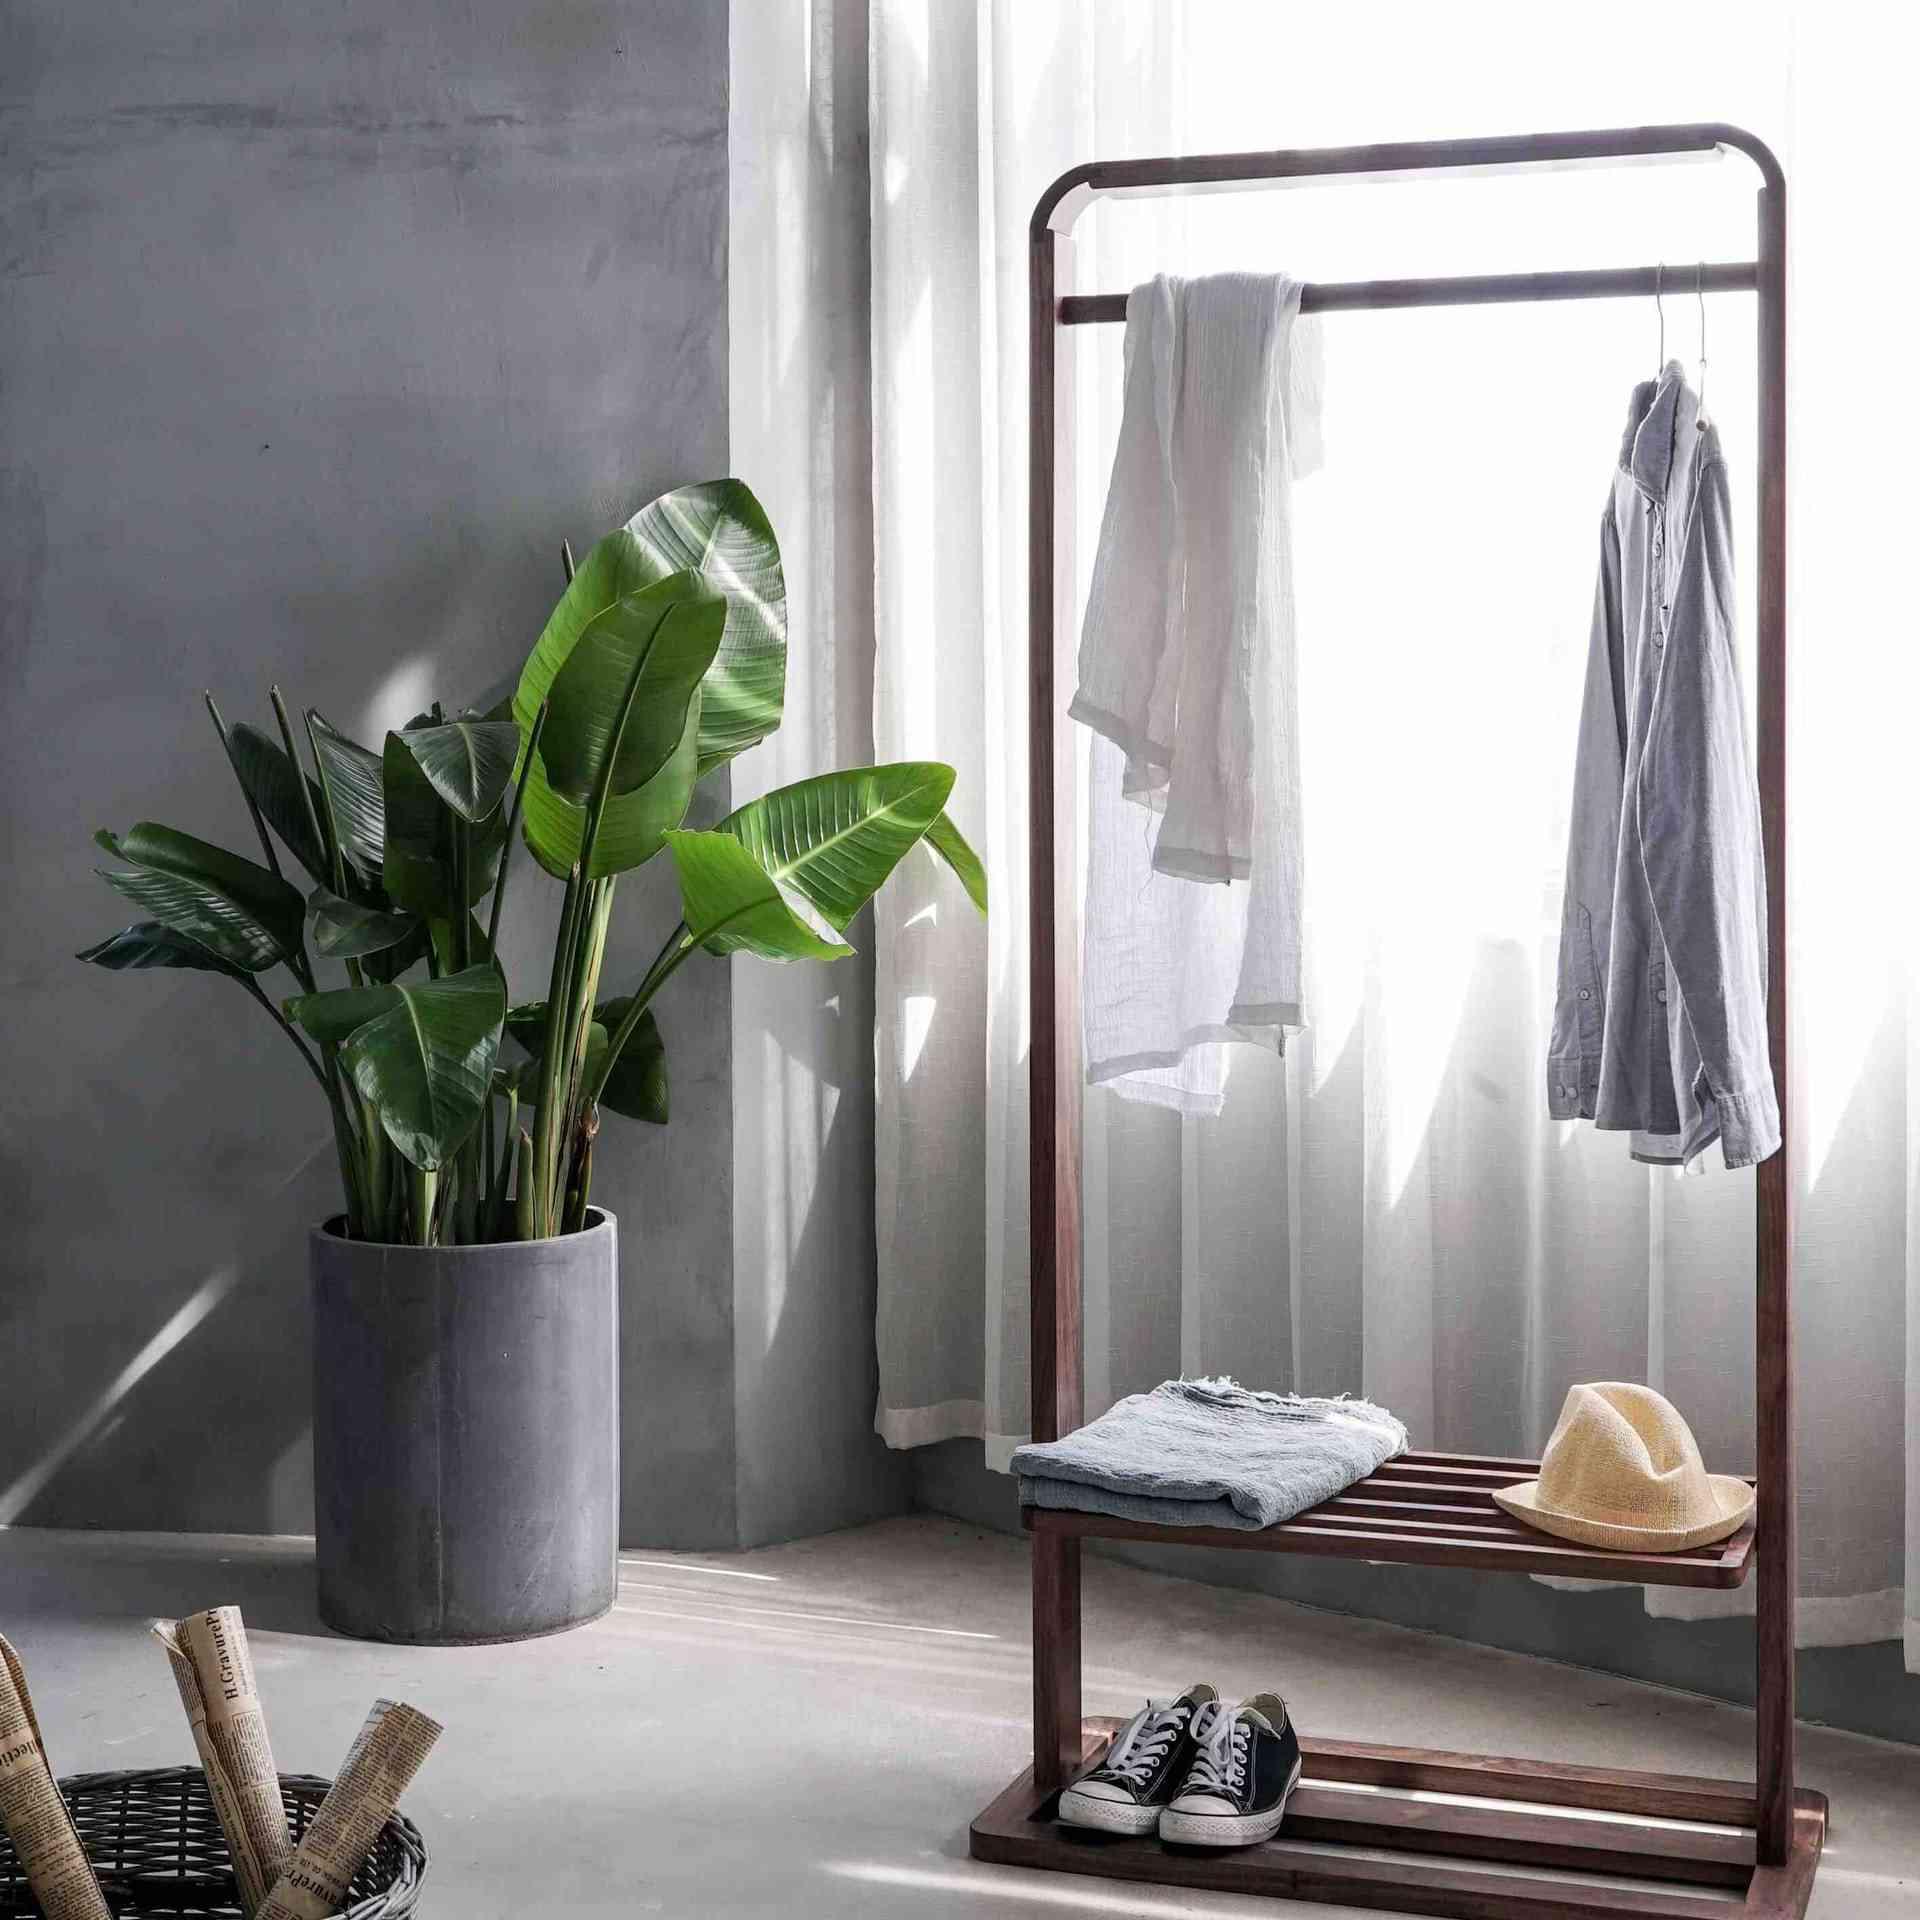 minimalist room with clothing rack